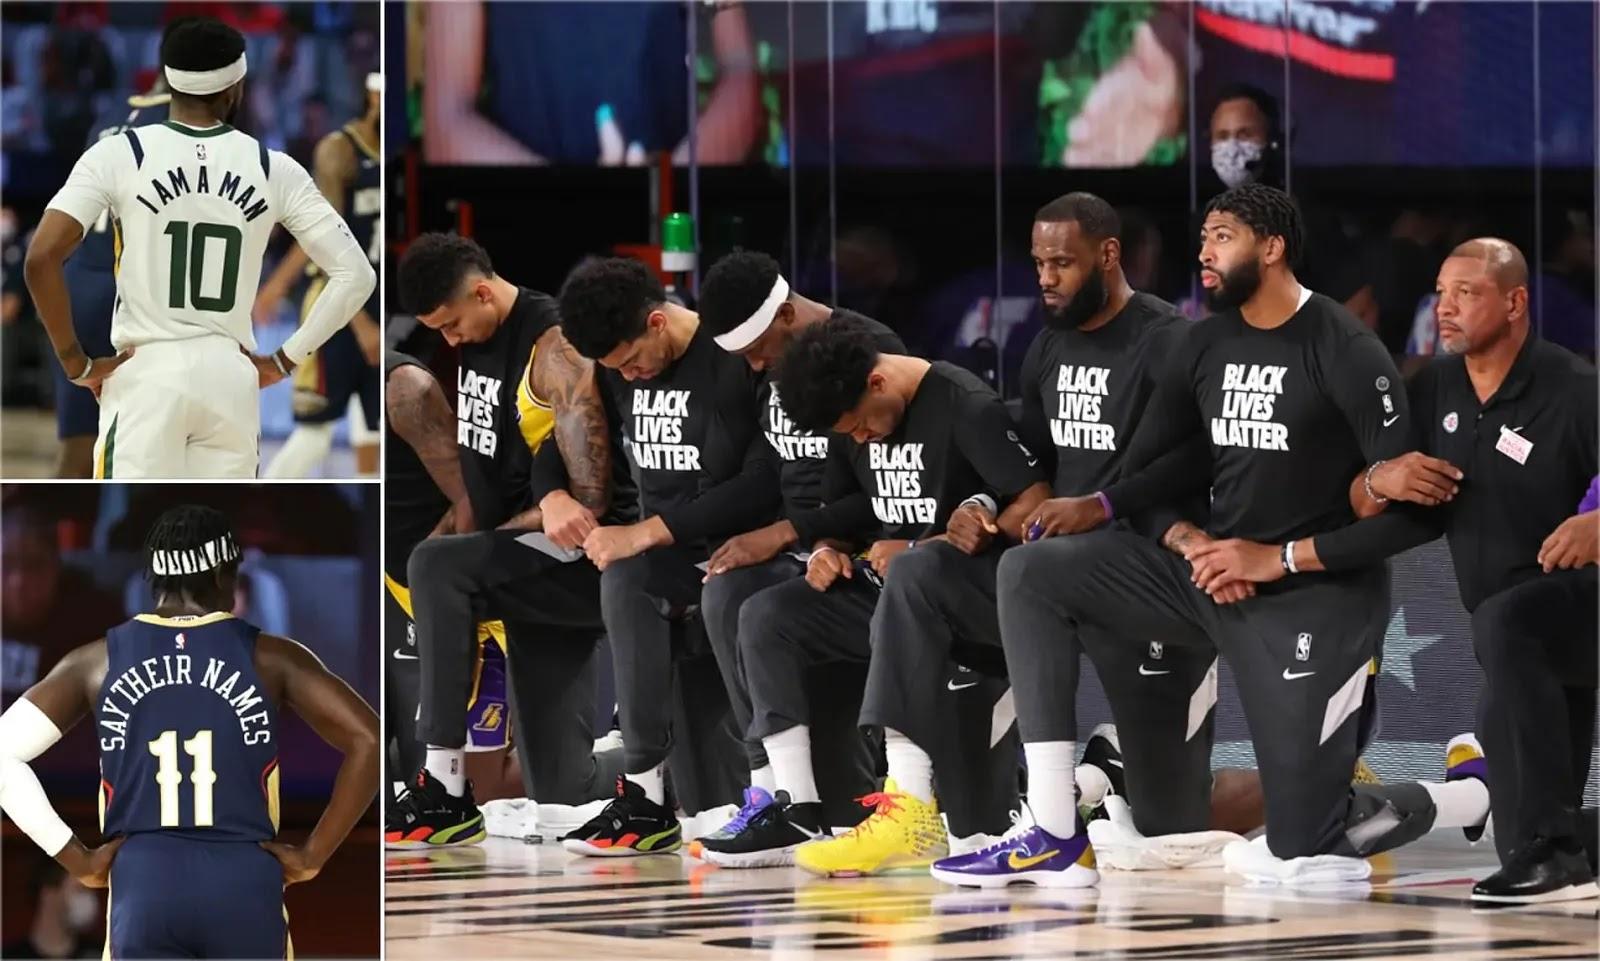 jugadores-NBA-protestan-contra-injusticia-racial